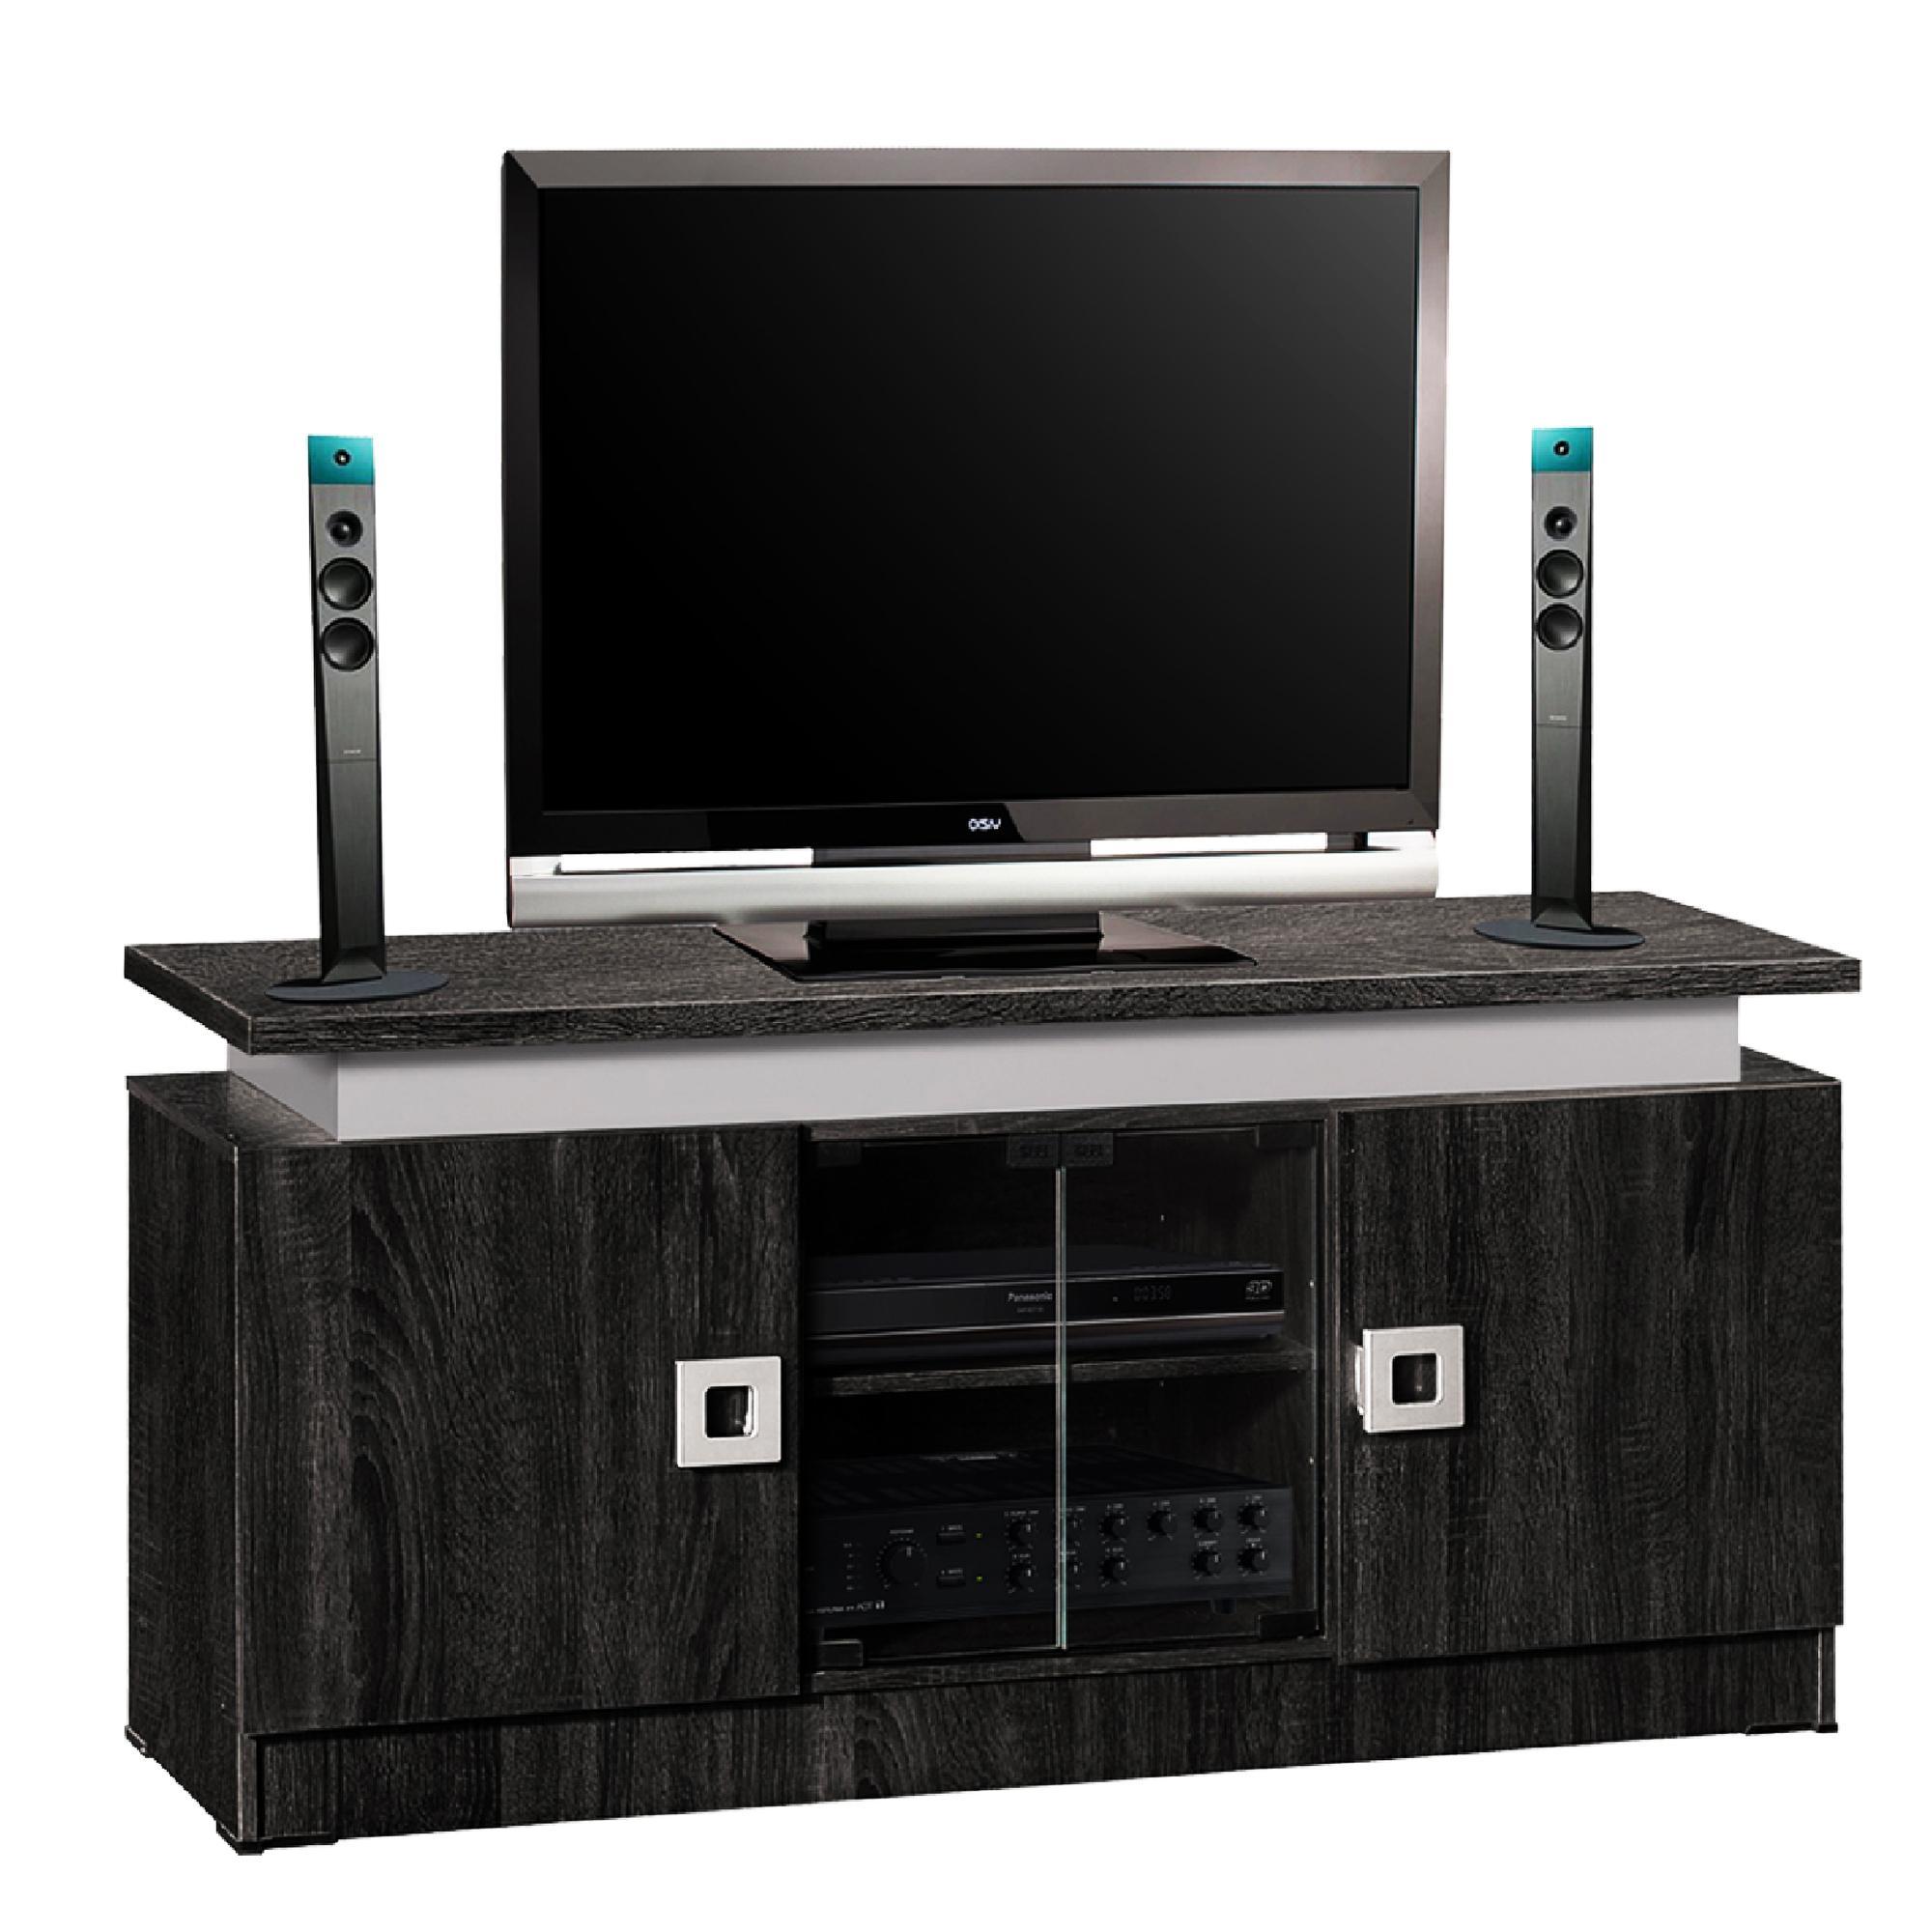 Kirana Furniture Audio Rak Rak Tv Meja Tv Bf 828 Wo - Daftar Harga .